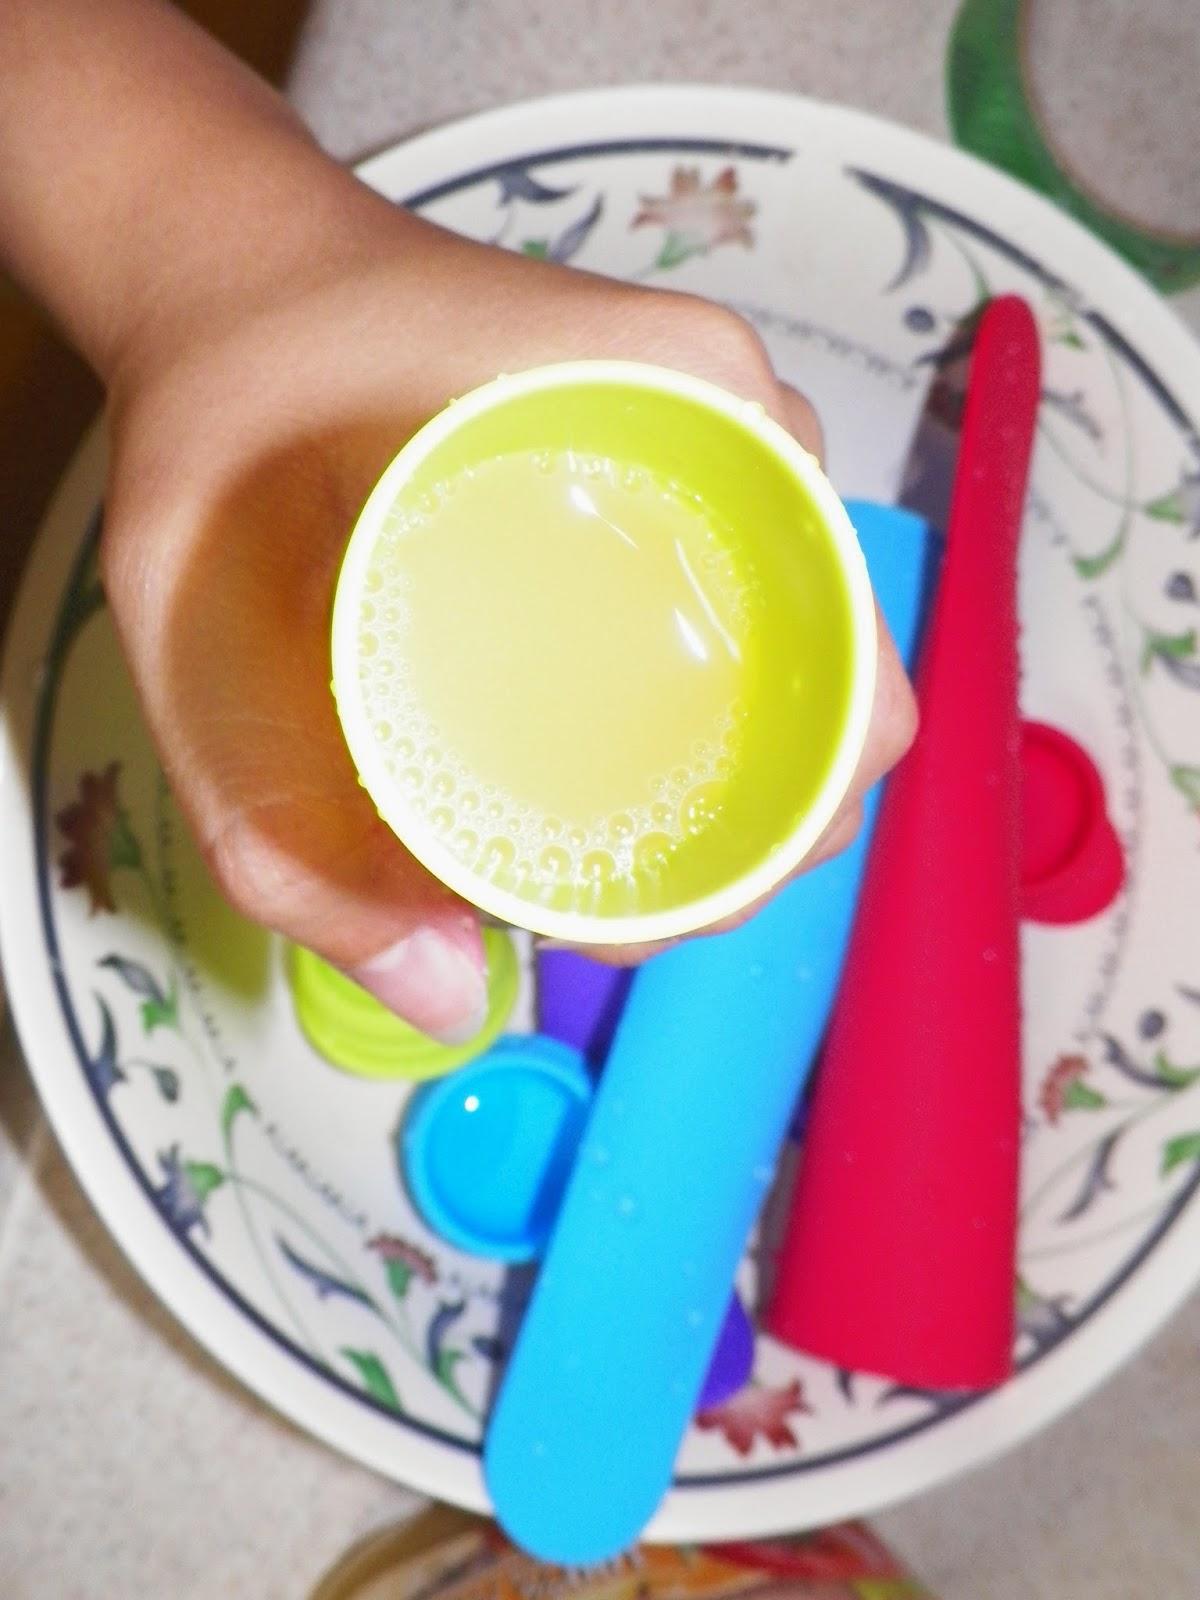 Kuuk_Silicone_Popsicle_Mold.jpg